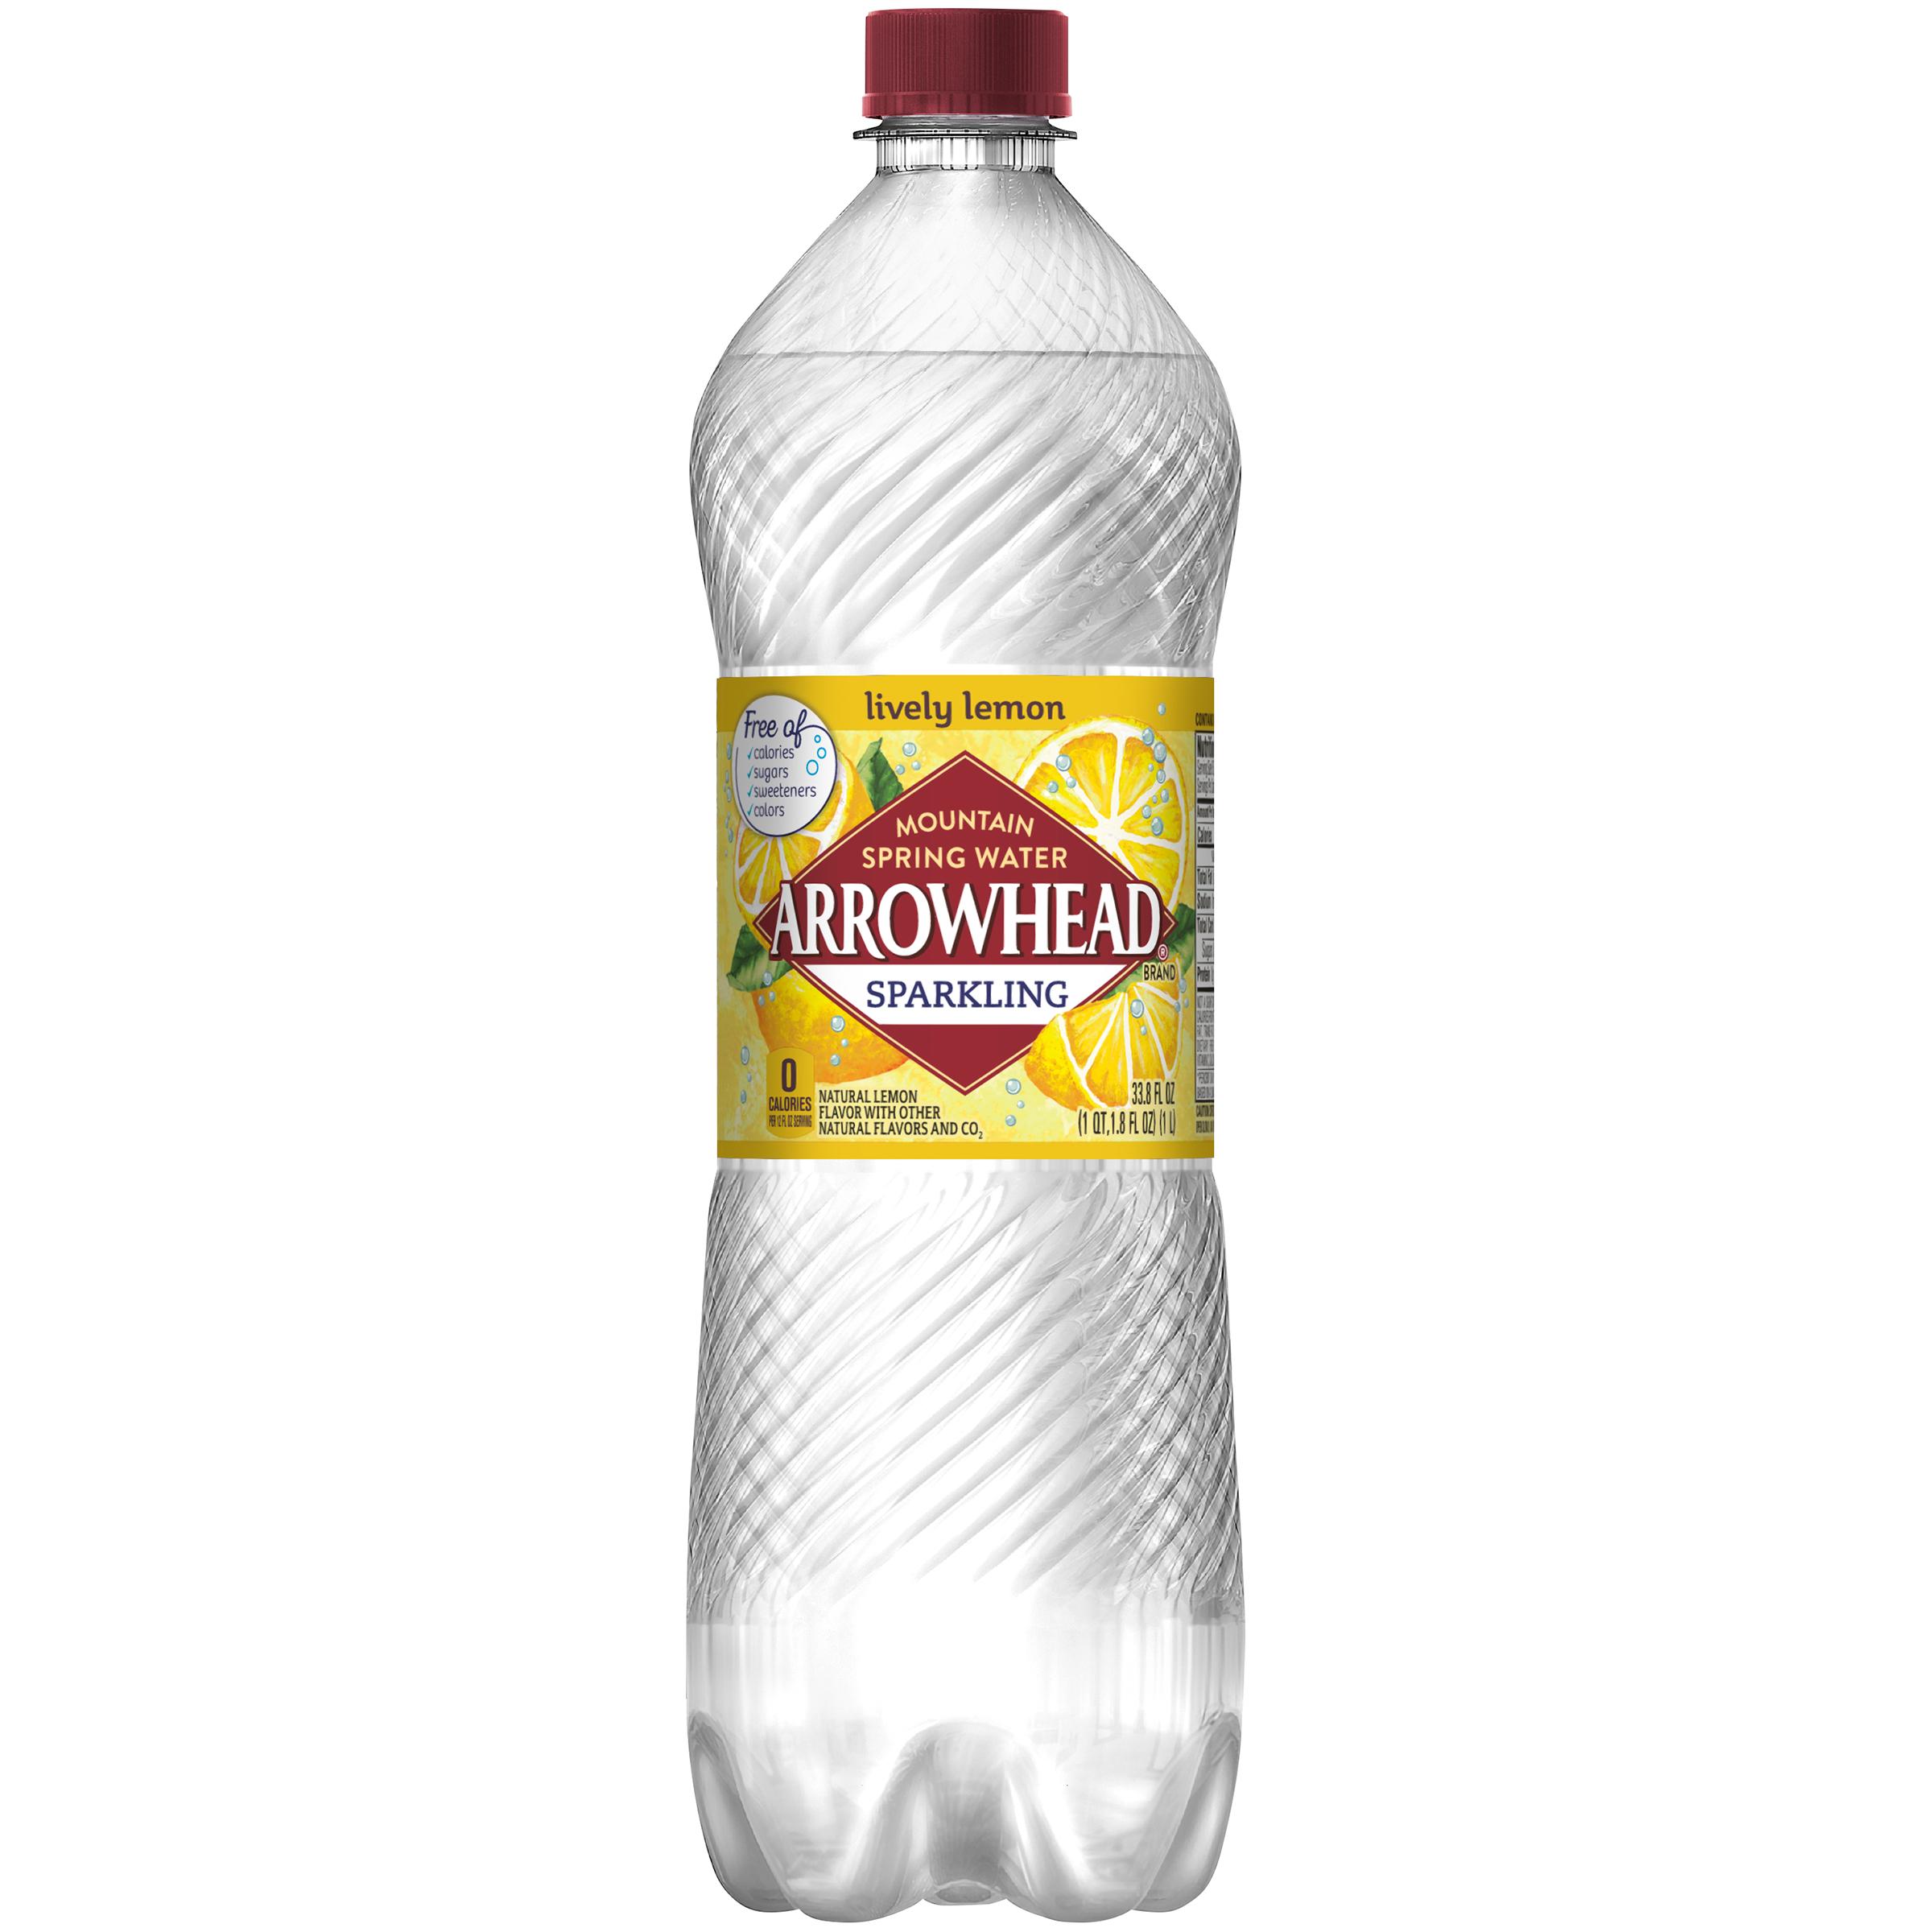 Arrowhead Zesty Lively Lemon Sparkling Water, 33.8 Fl. Oz.